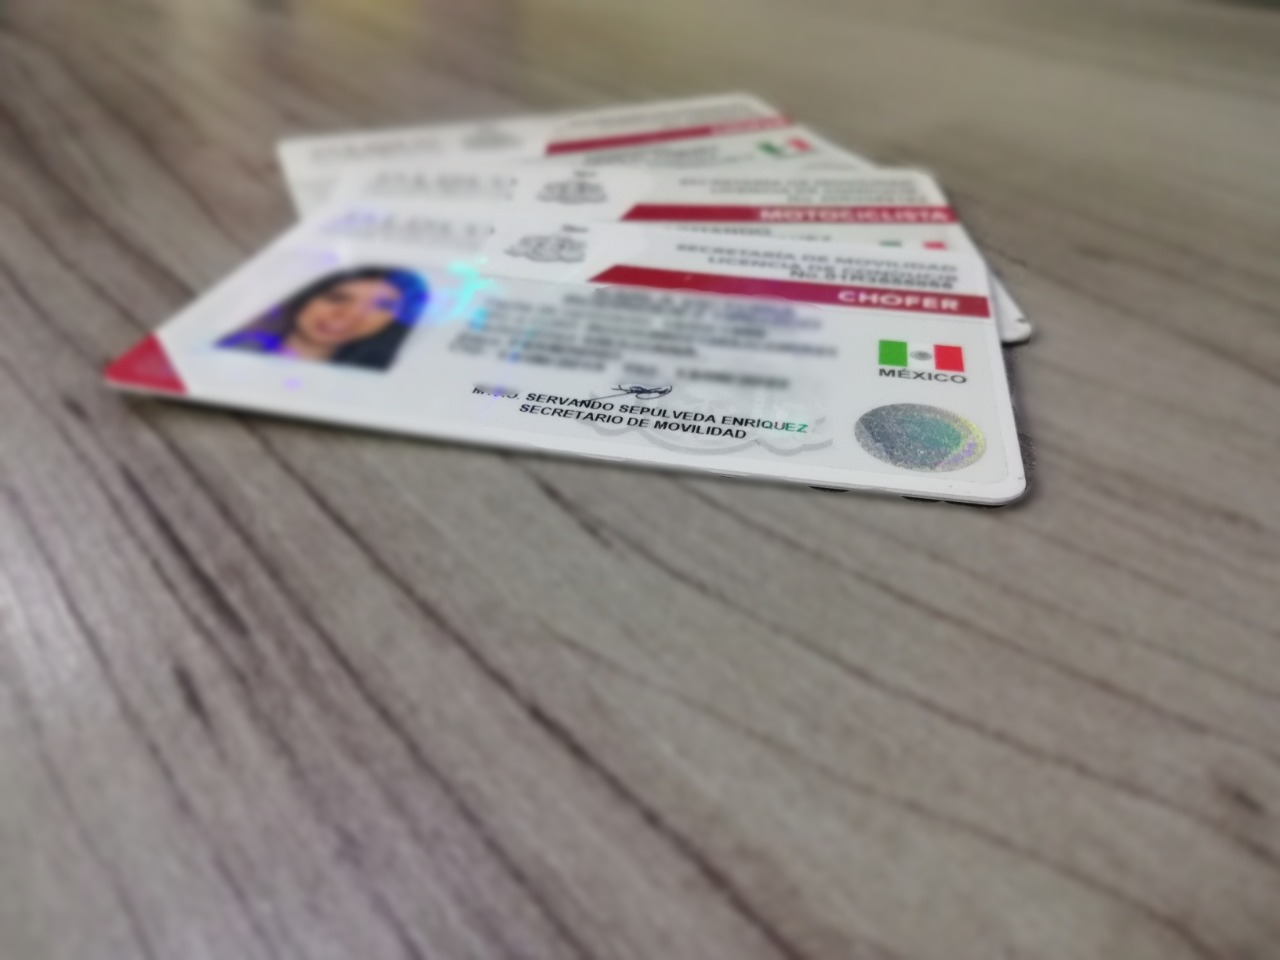 licencia de conducir Jalisco 1